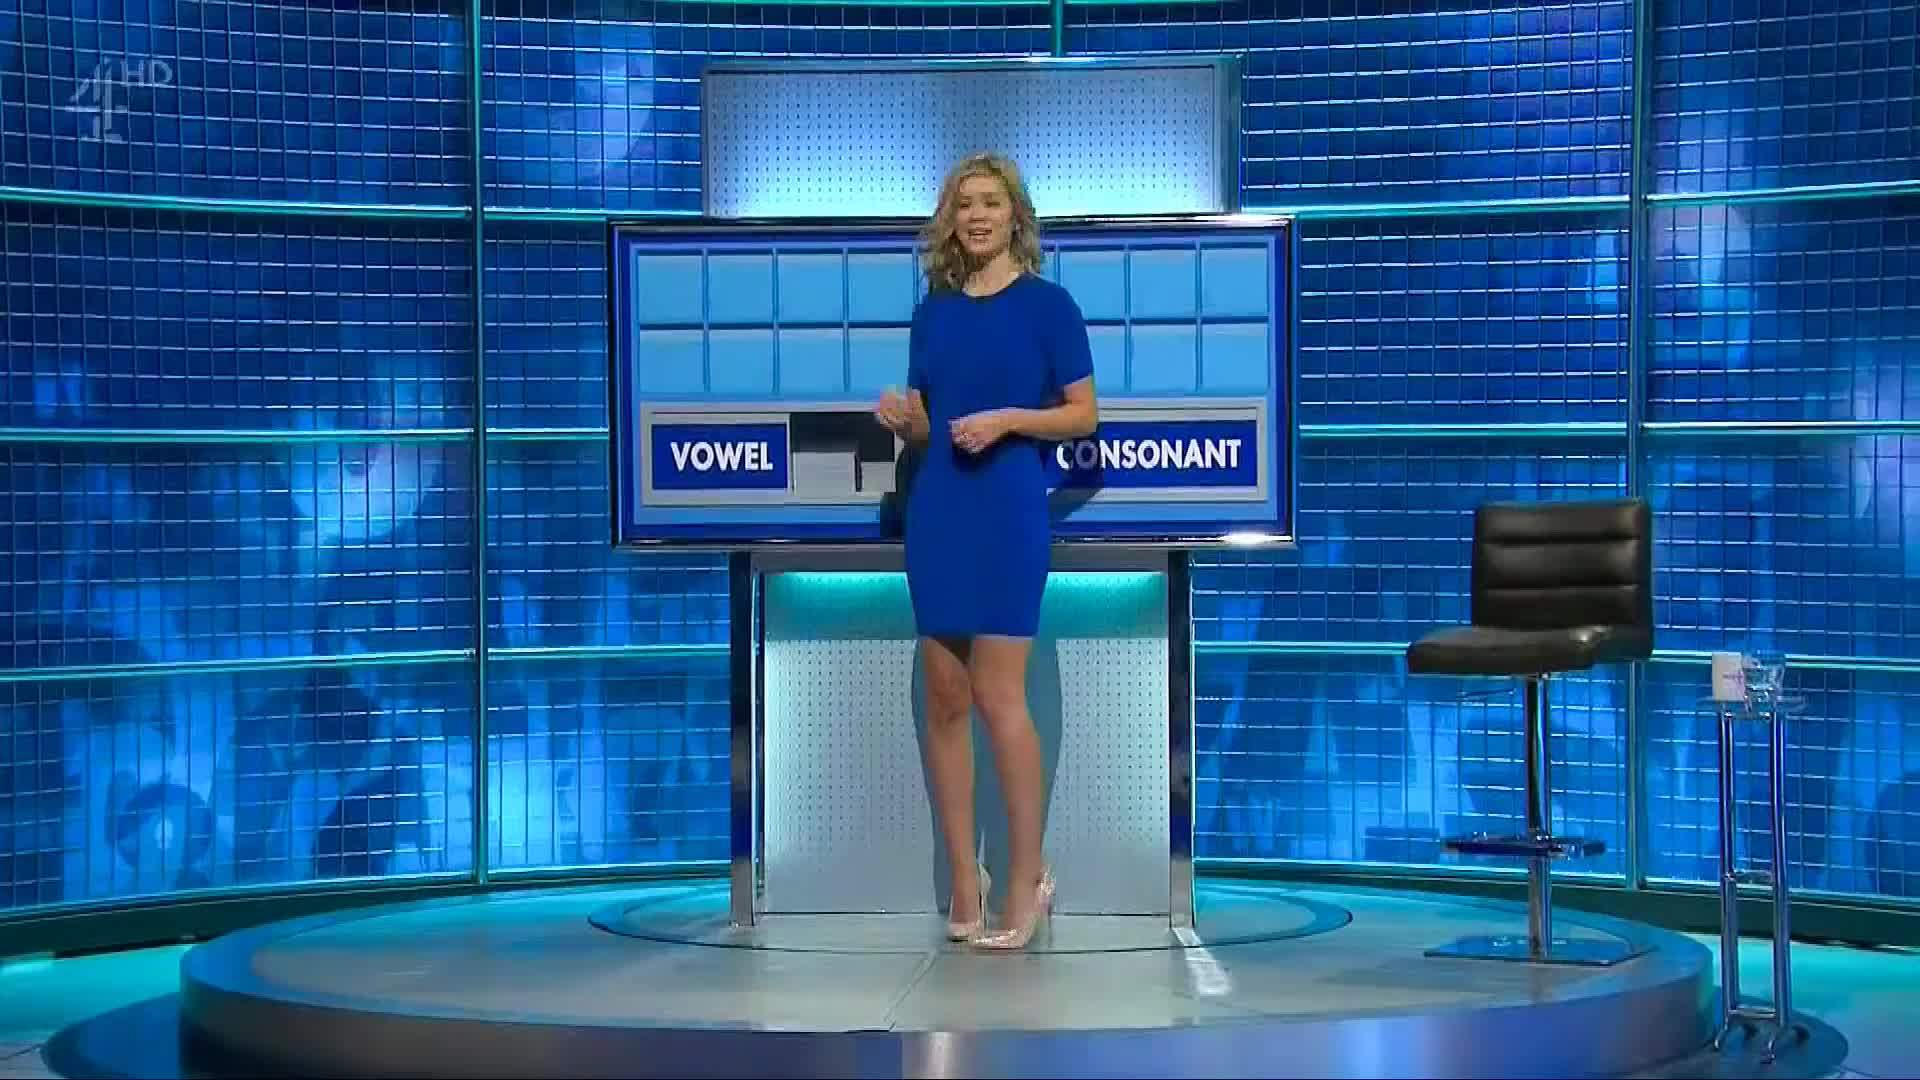 rachel riley, rachelriley, tight dress, Rachel Riley - Lovely Blue Dress GIFs